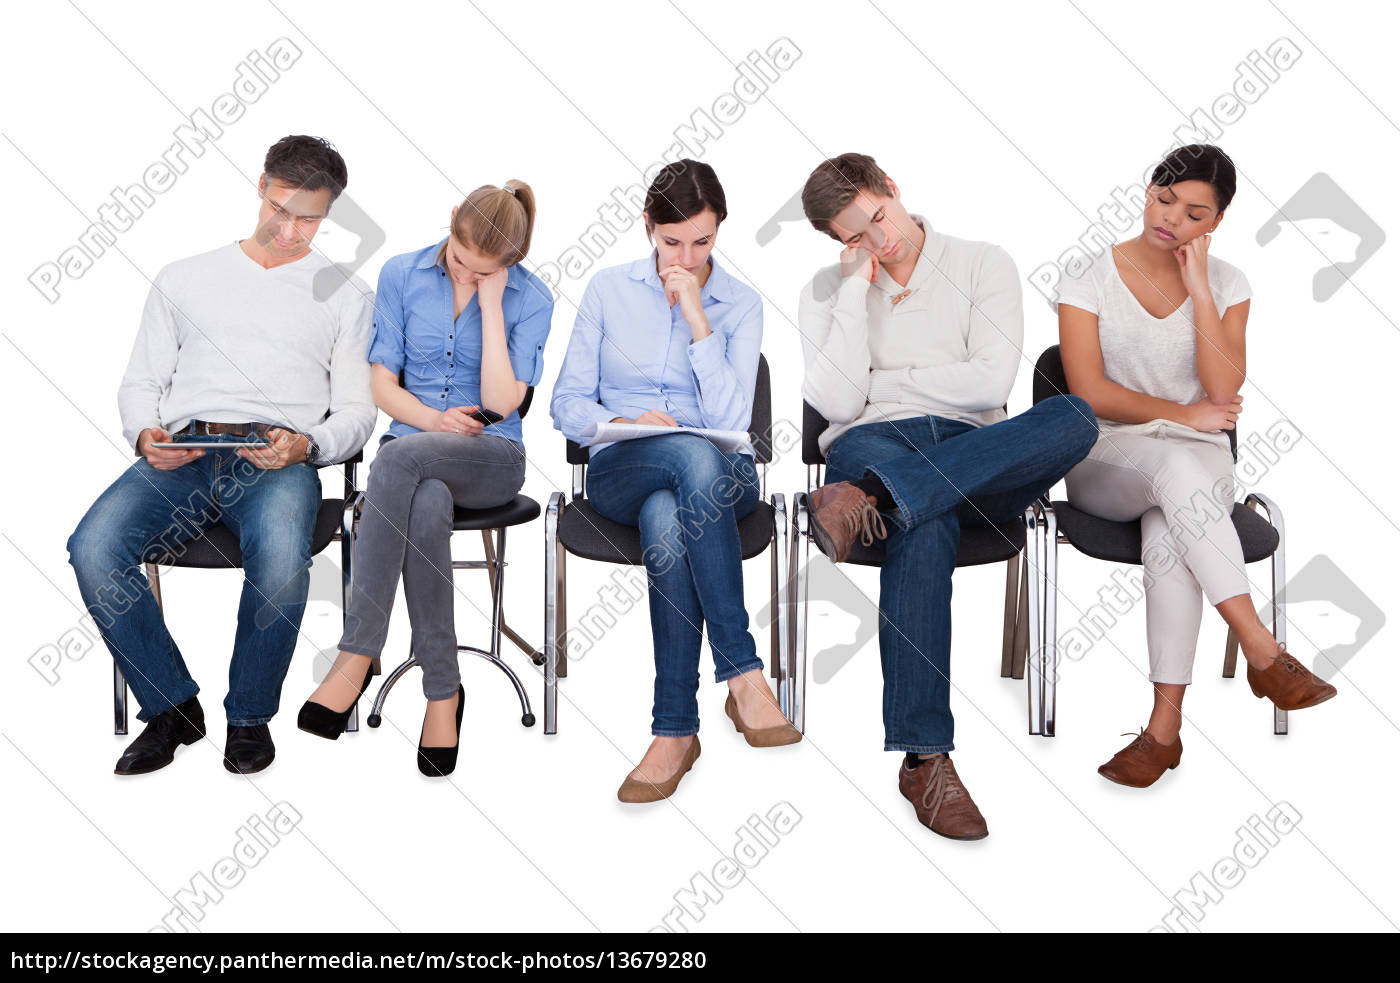 group, of, people, sleeping, on, chair - 13679280